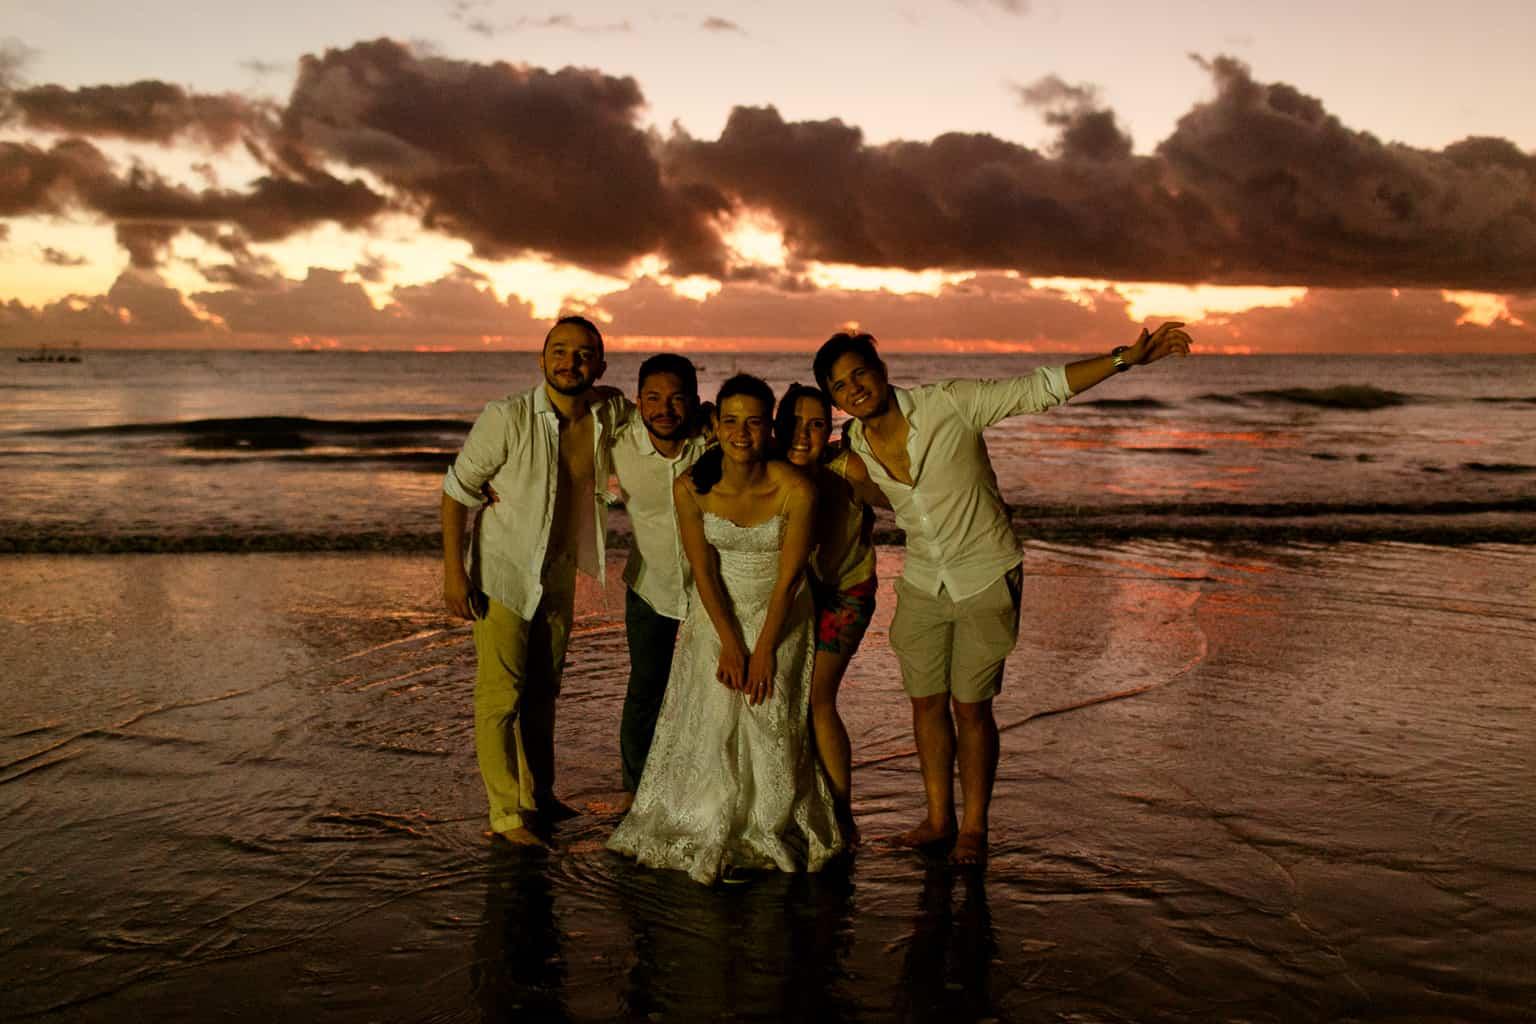 Casamento-Emanuelle-e-Alysson-Fotografia-Tadeu-Nanó-e-Luca-Antunes244